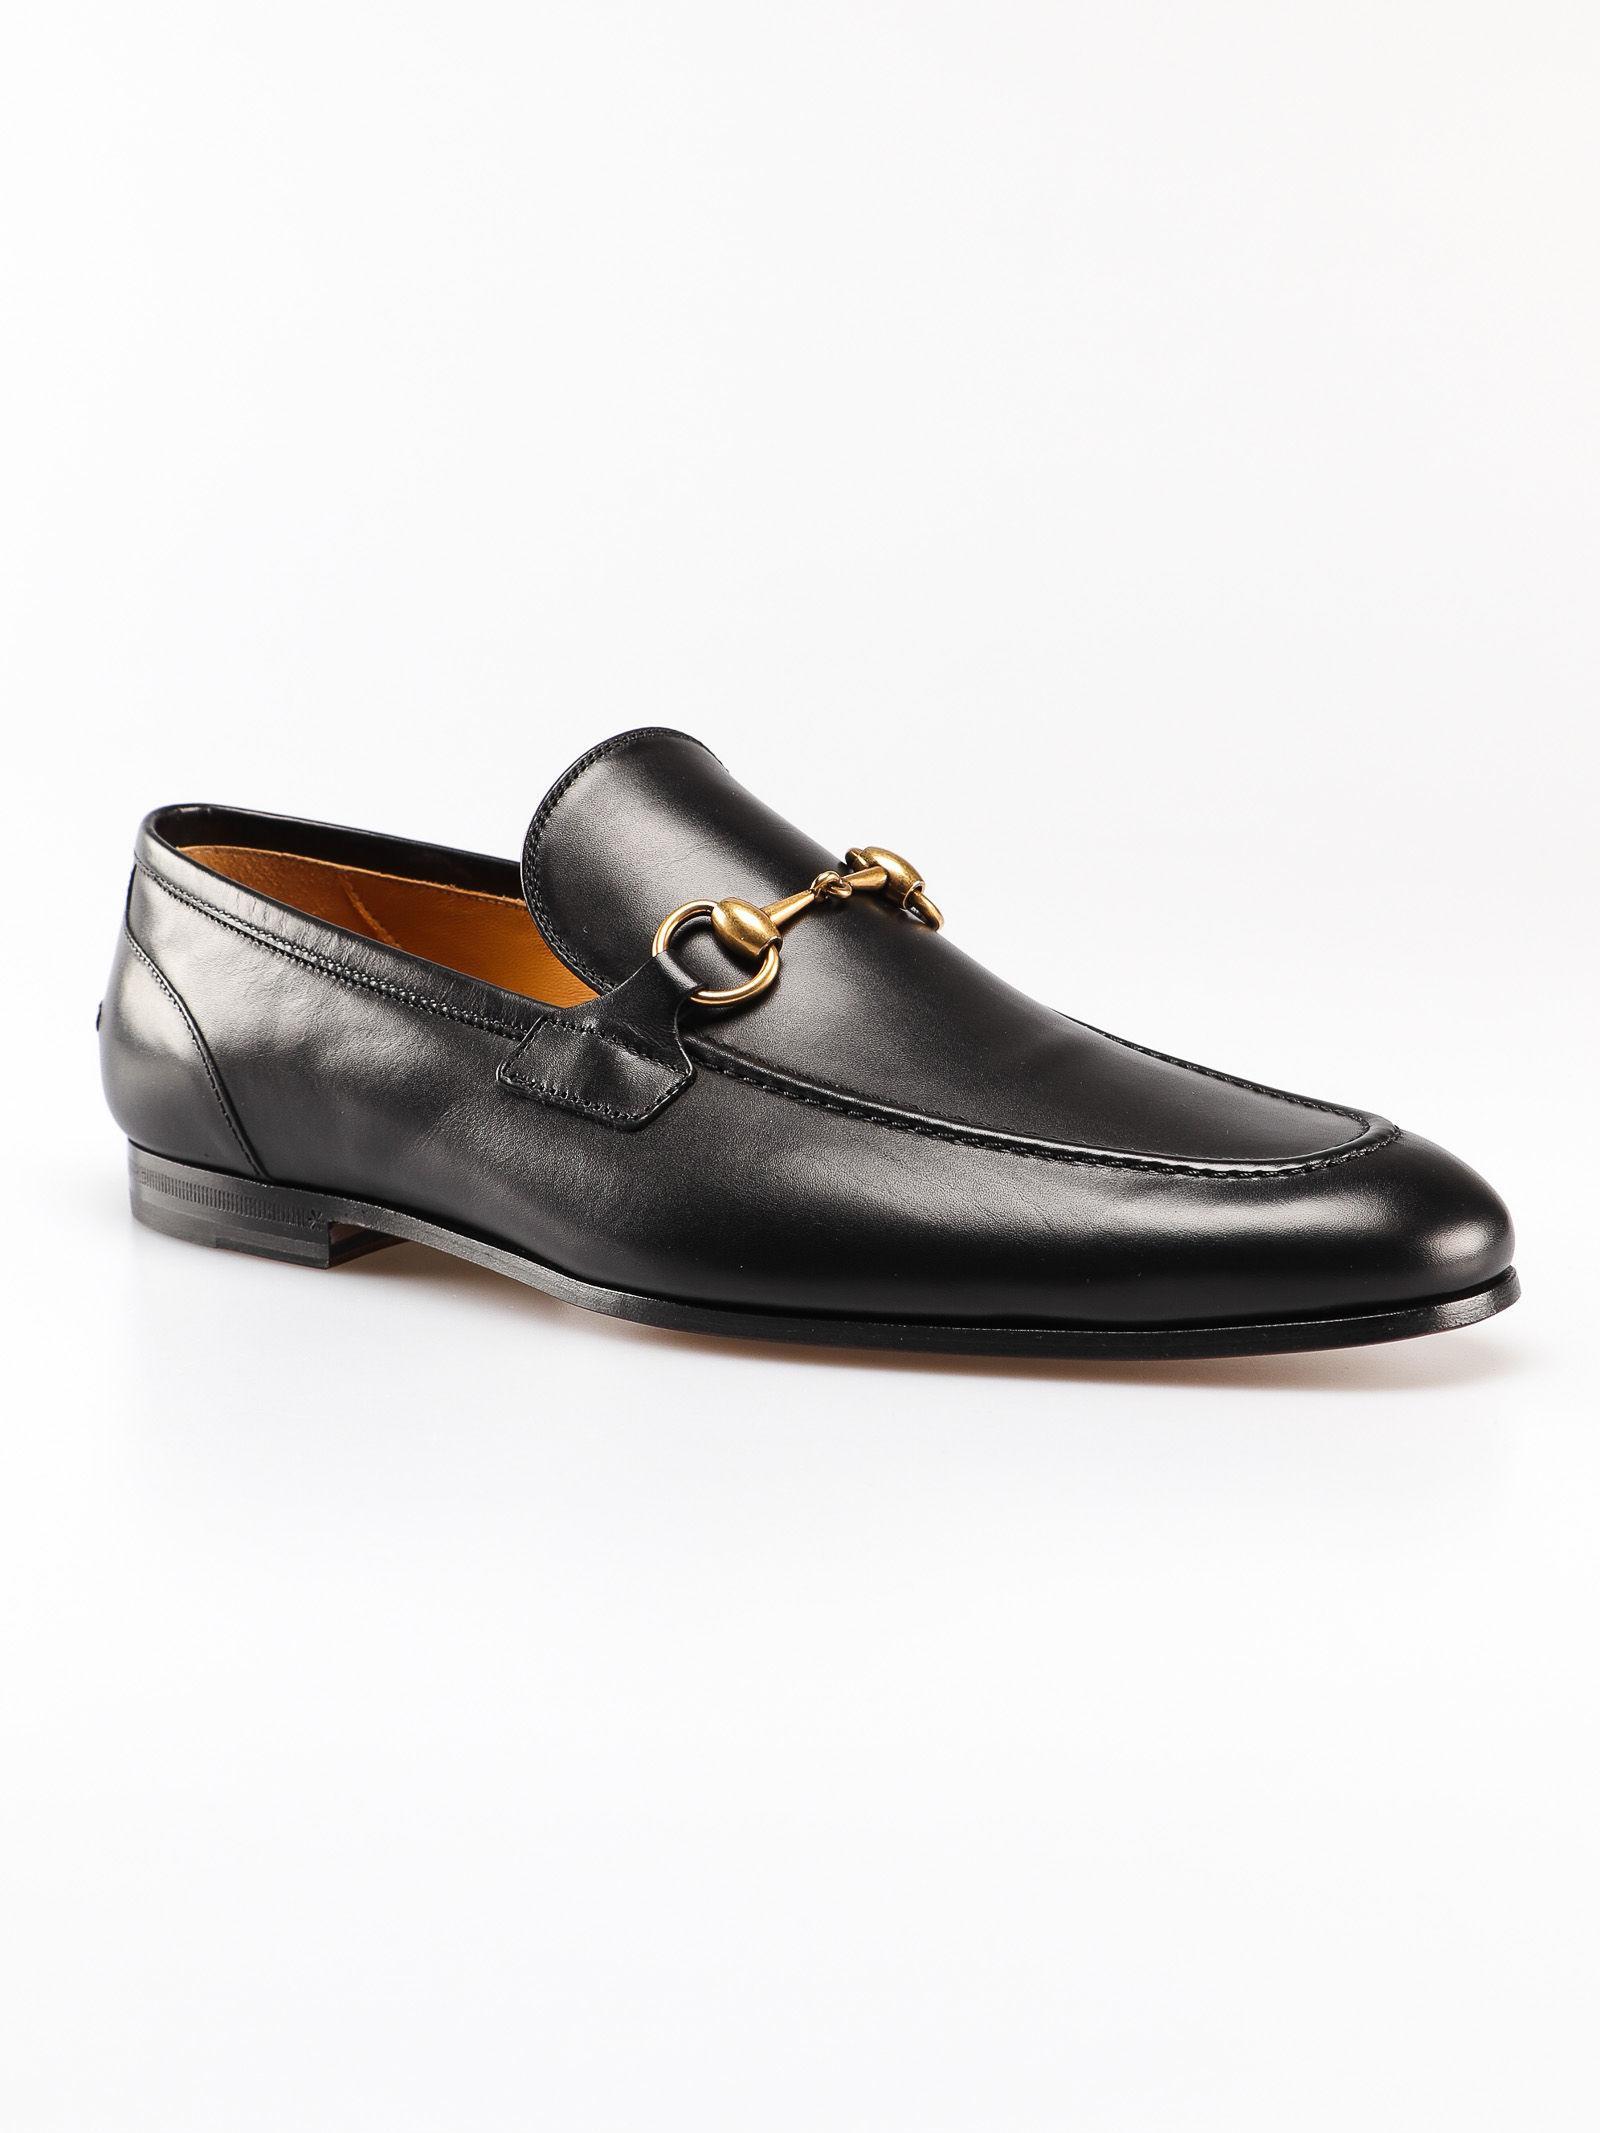 e2b7108ea Gucci Jordaan Loafers in Black for Men - Lyst